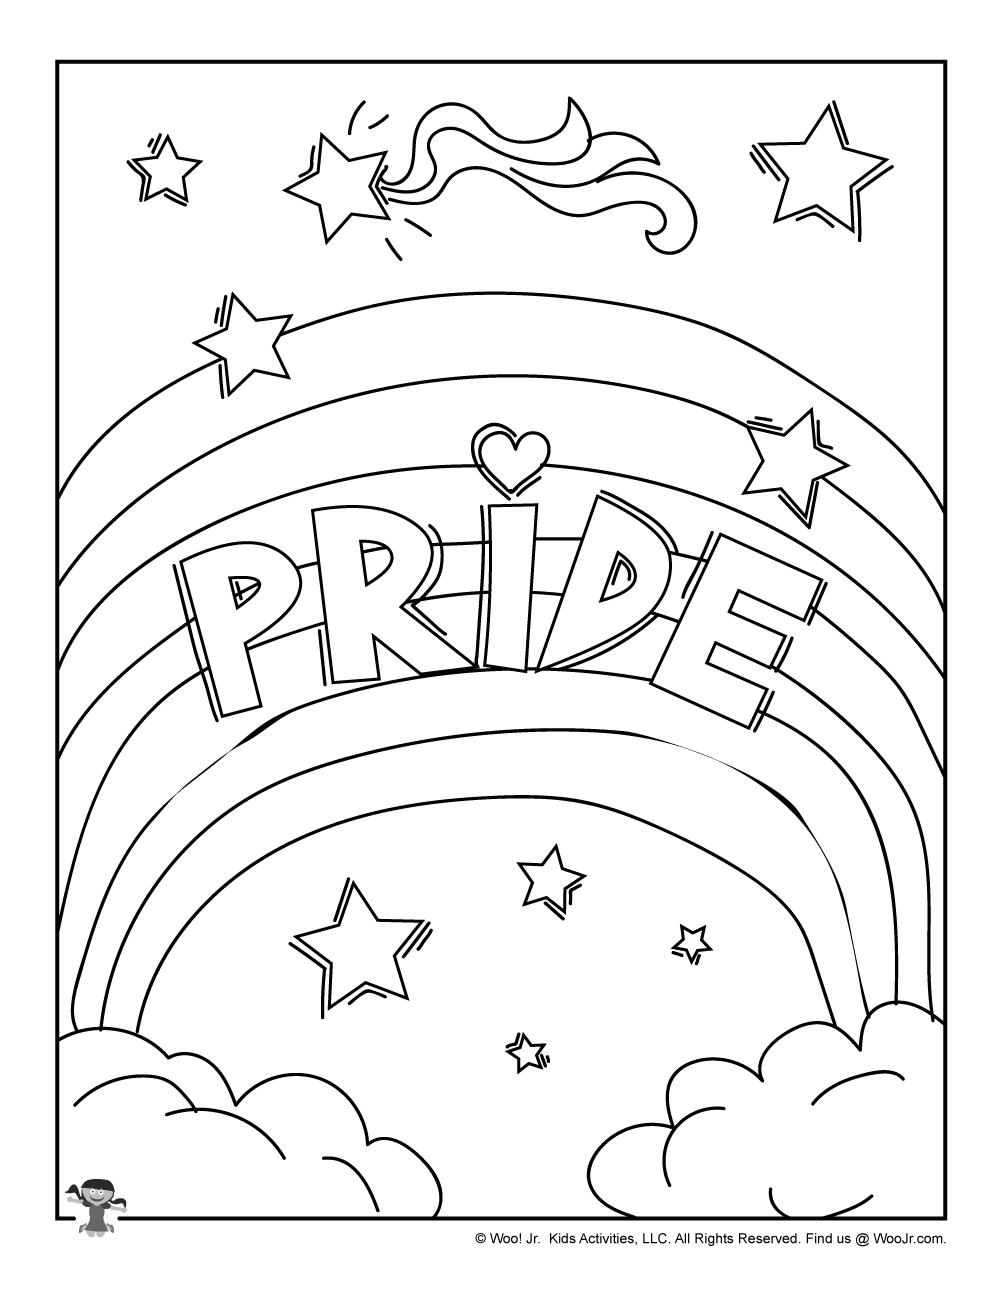 PRIDE-LGBTQ-Coloring-Page | Woo! Jr. Kids Activities